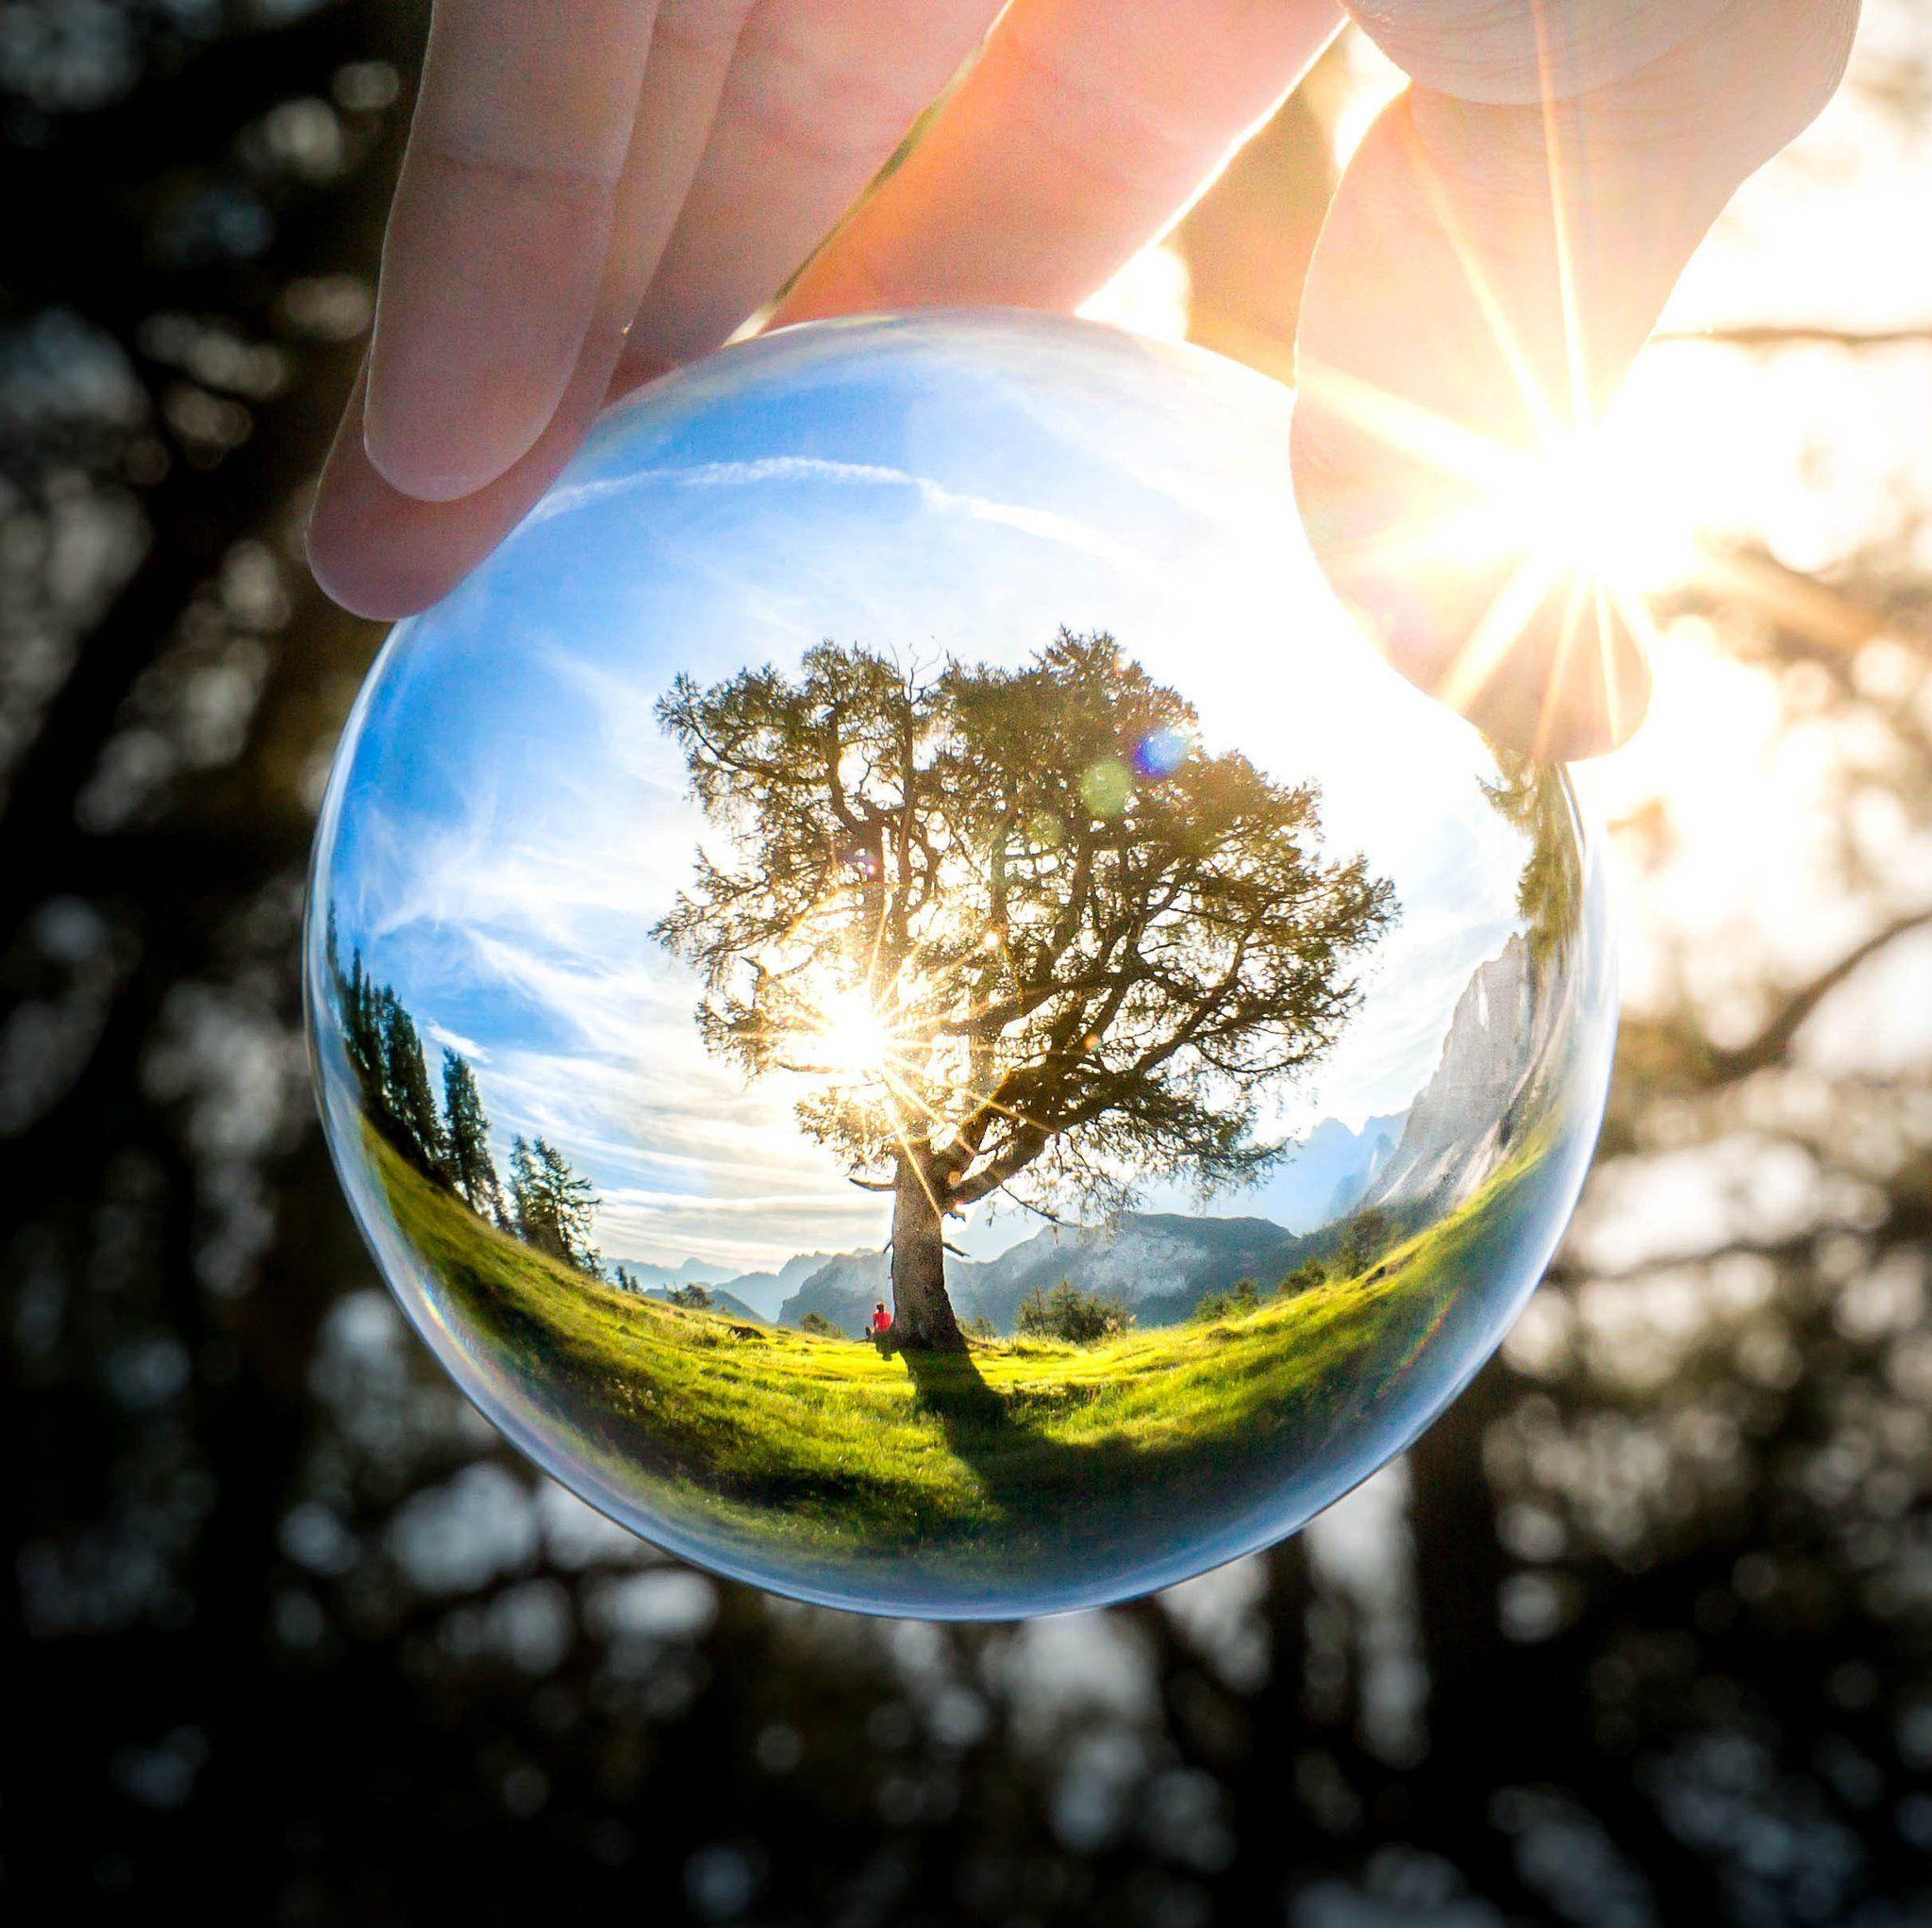 Original Lensball Pro Crystal Photography Photography Lenses Crystal Ball